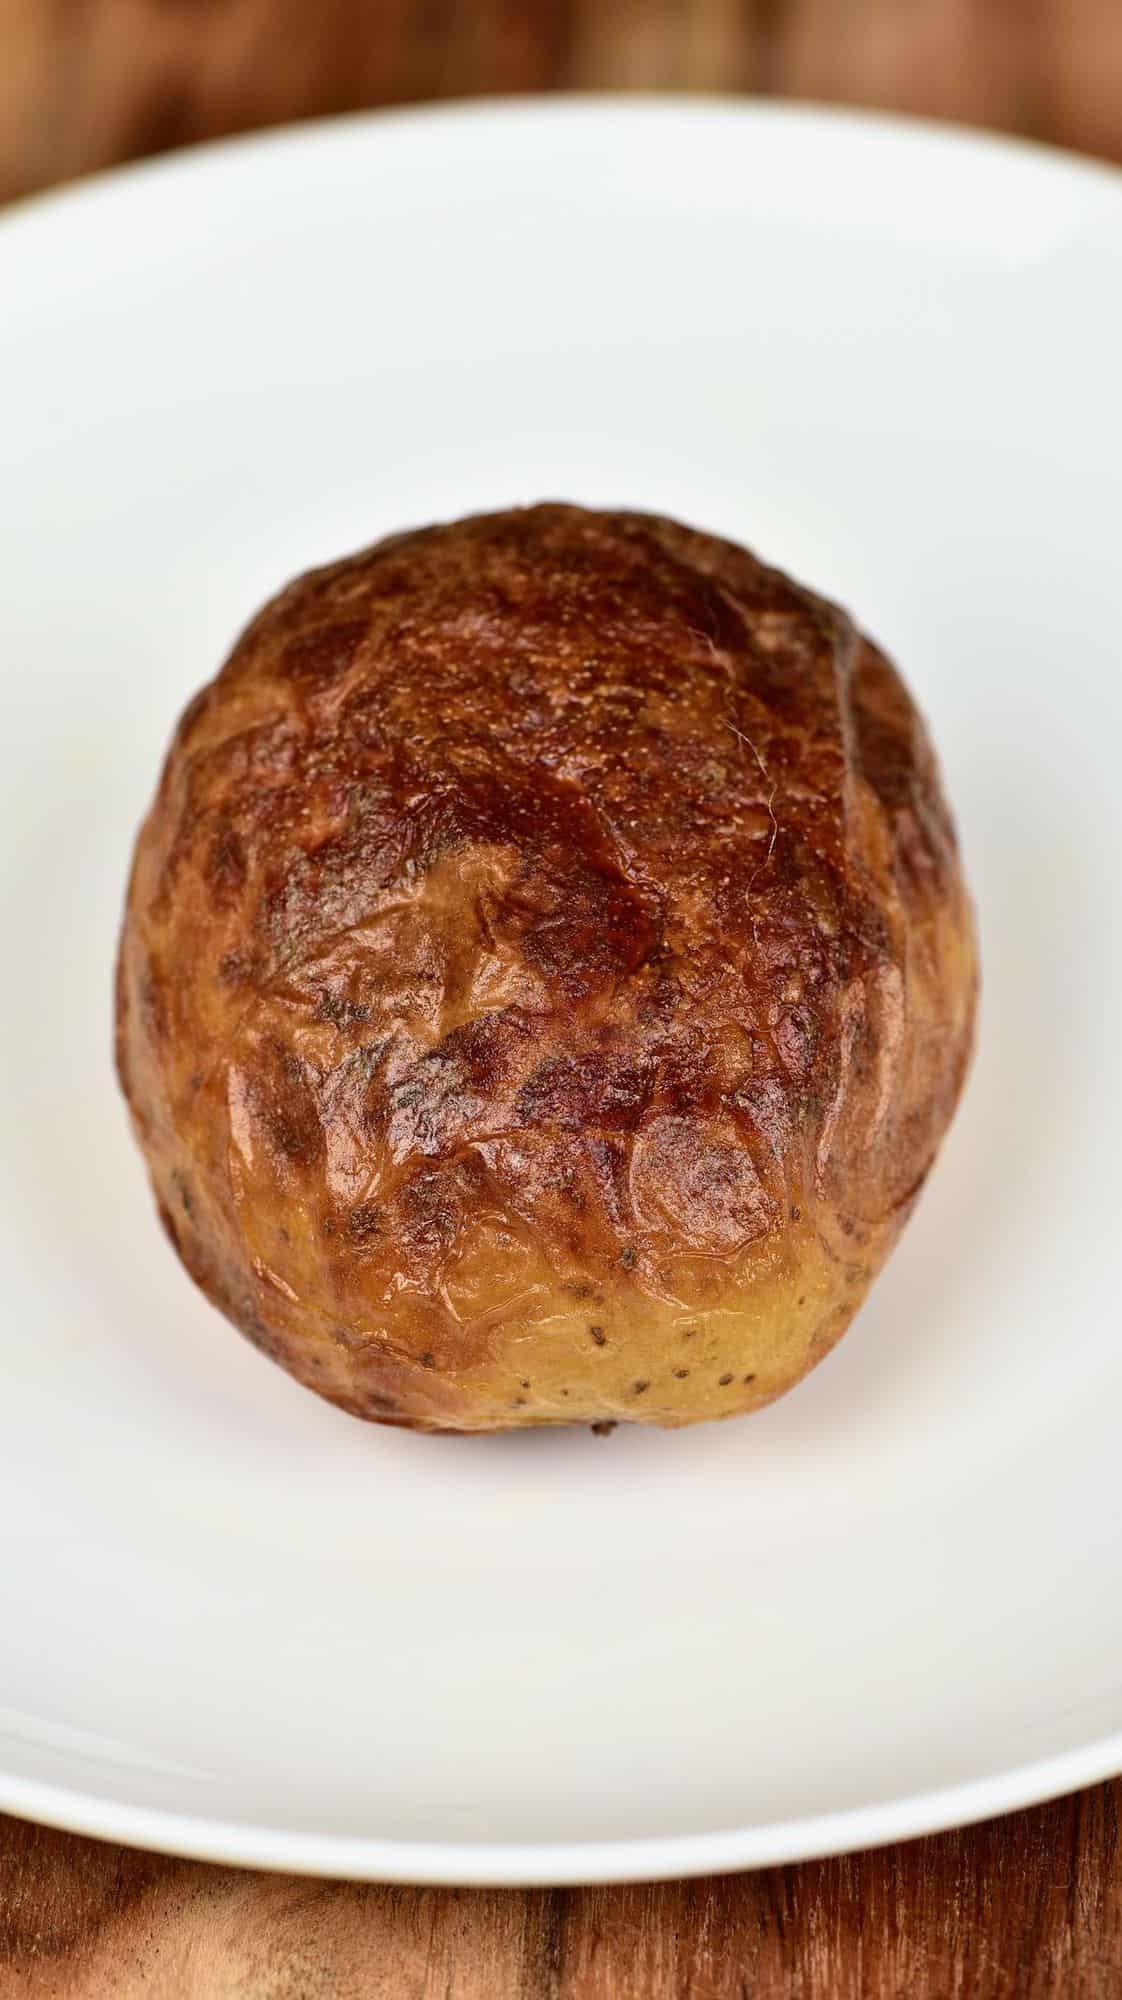 Salt baked potato in a plate